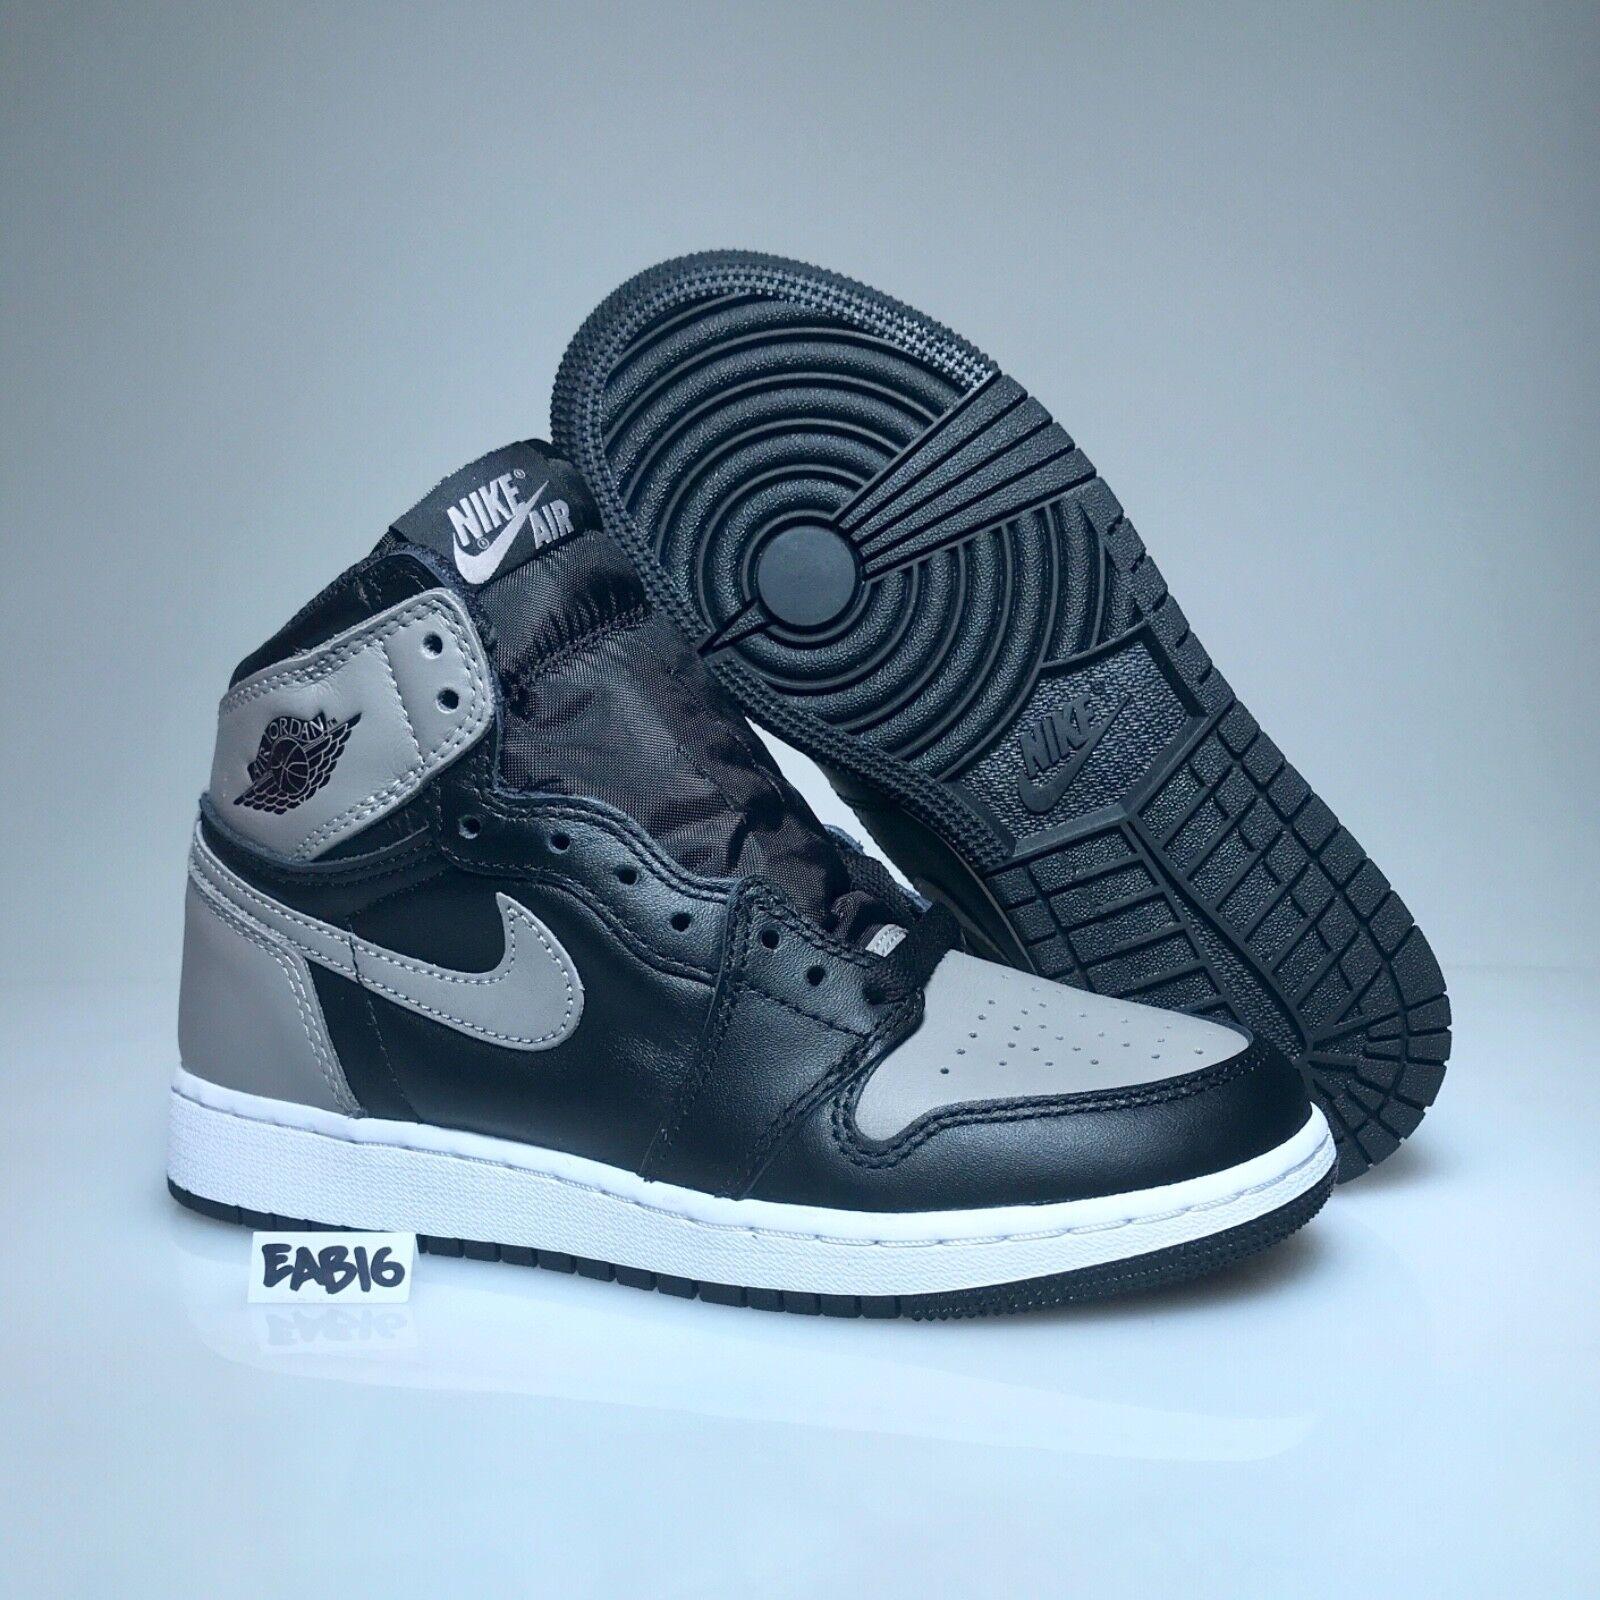 Nike Air Jordan Retro 1 OG BG Shadow Black Grey 575441 013 Gray Grade School GS The latest discount shoes for men and women